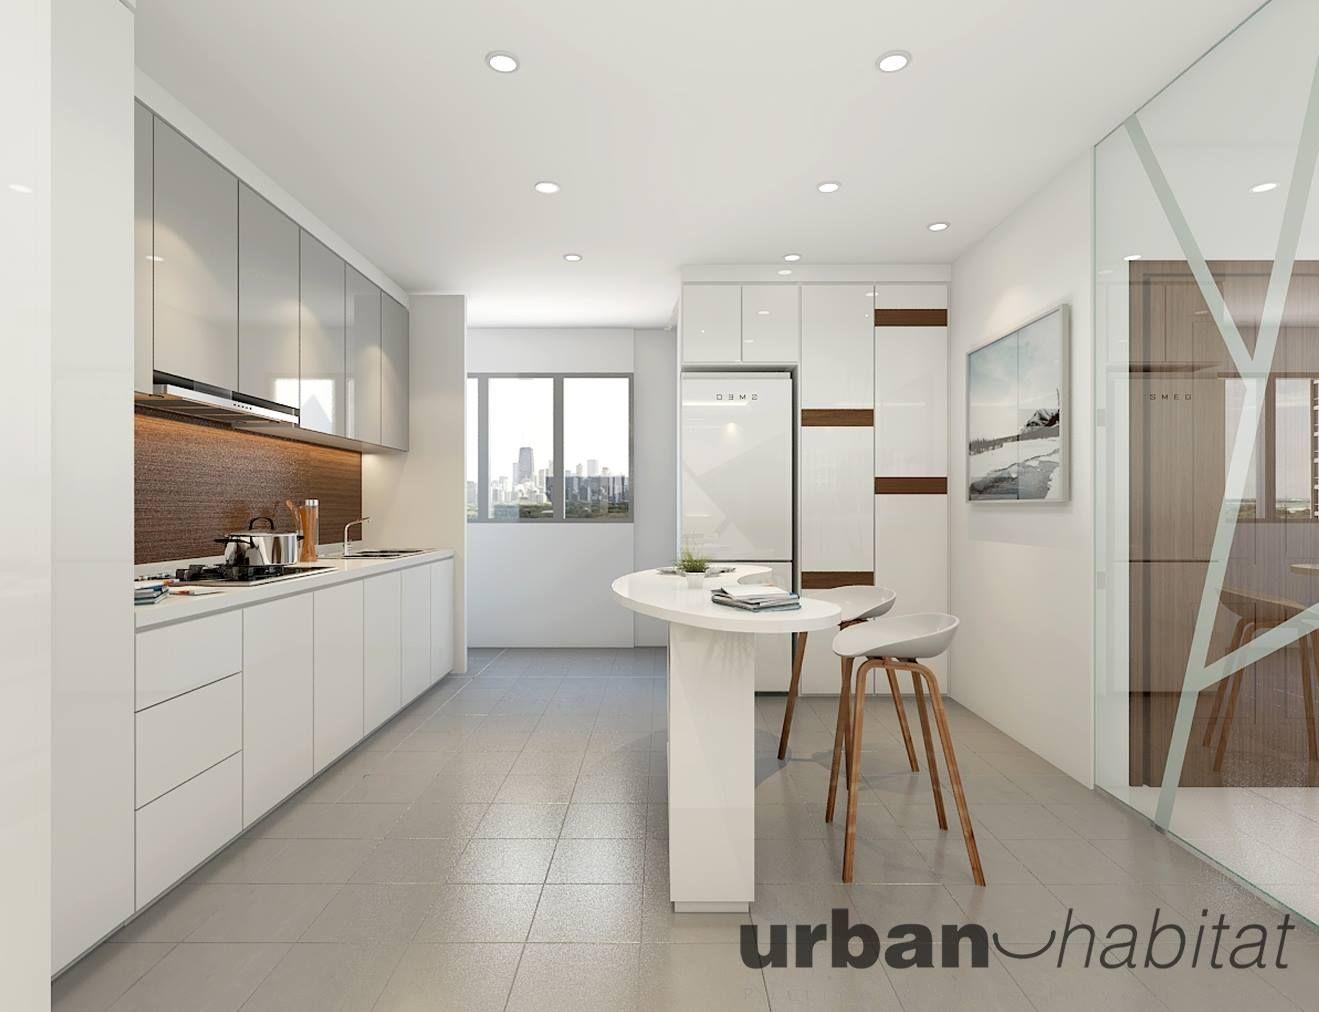 Hdb 5 Room Modern Contemporary Pasir Ris Modern Room Kitchen Design Interior Design Singapore